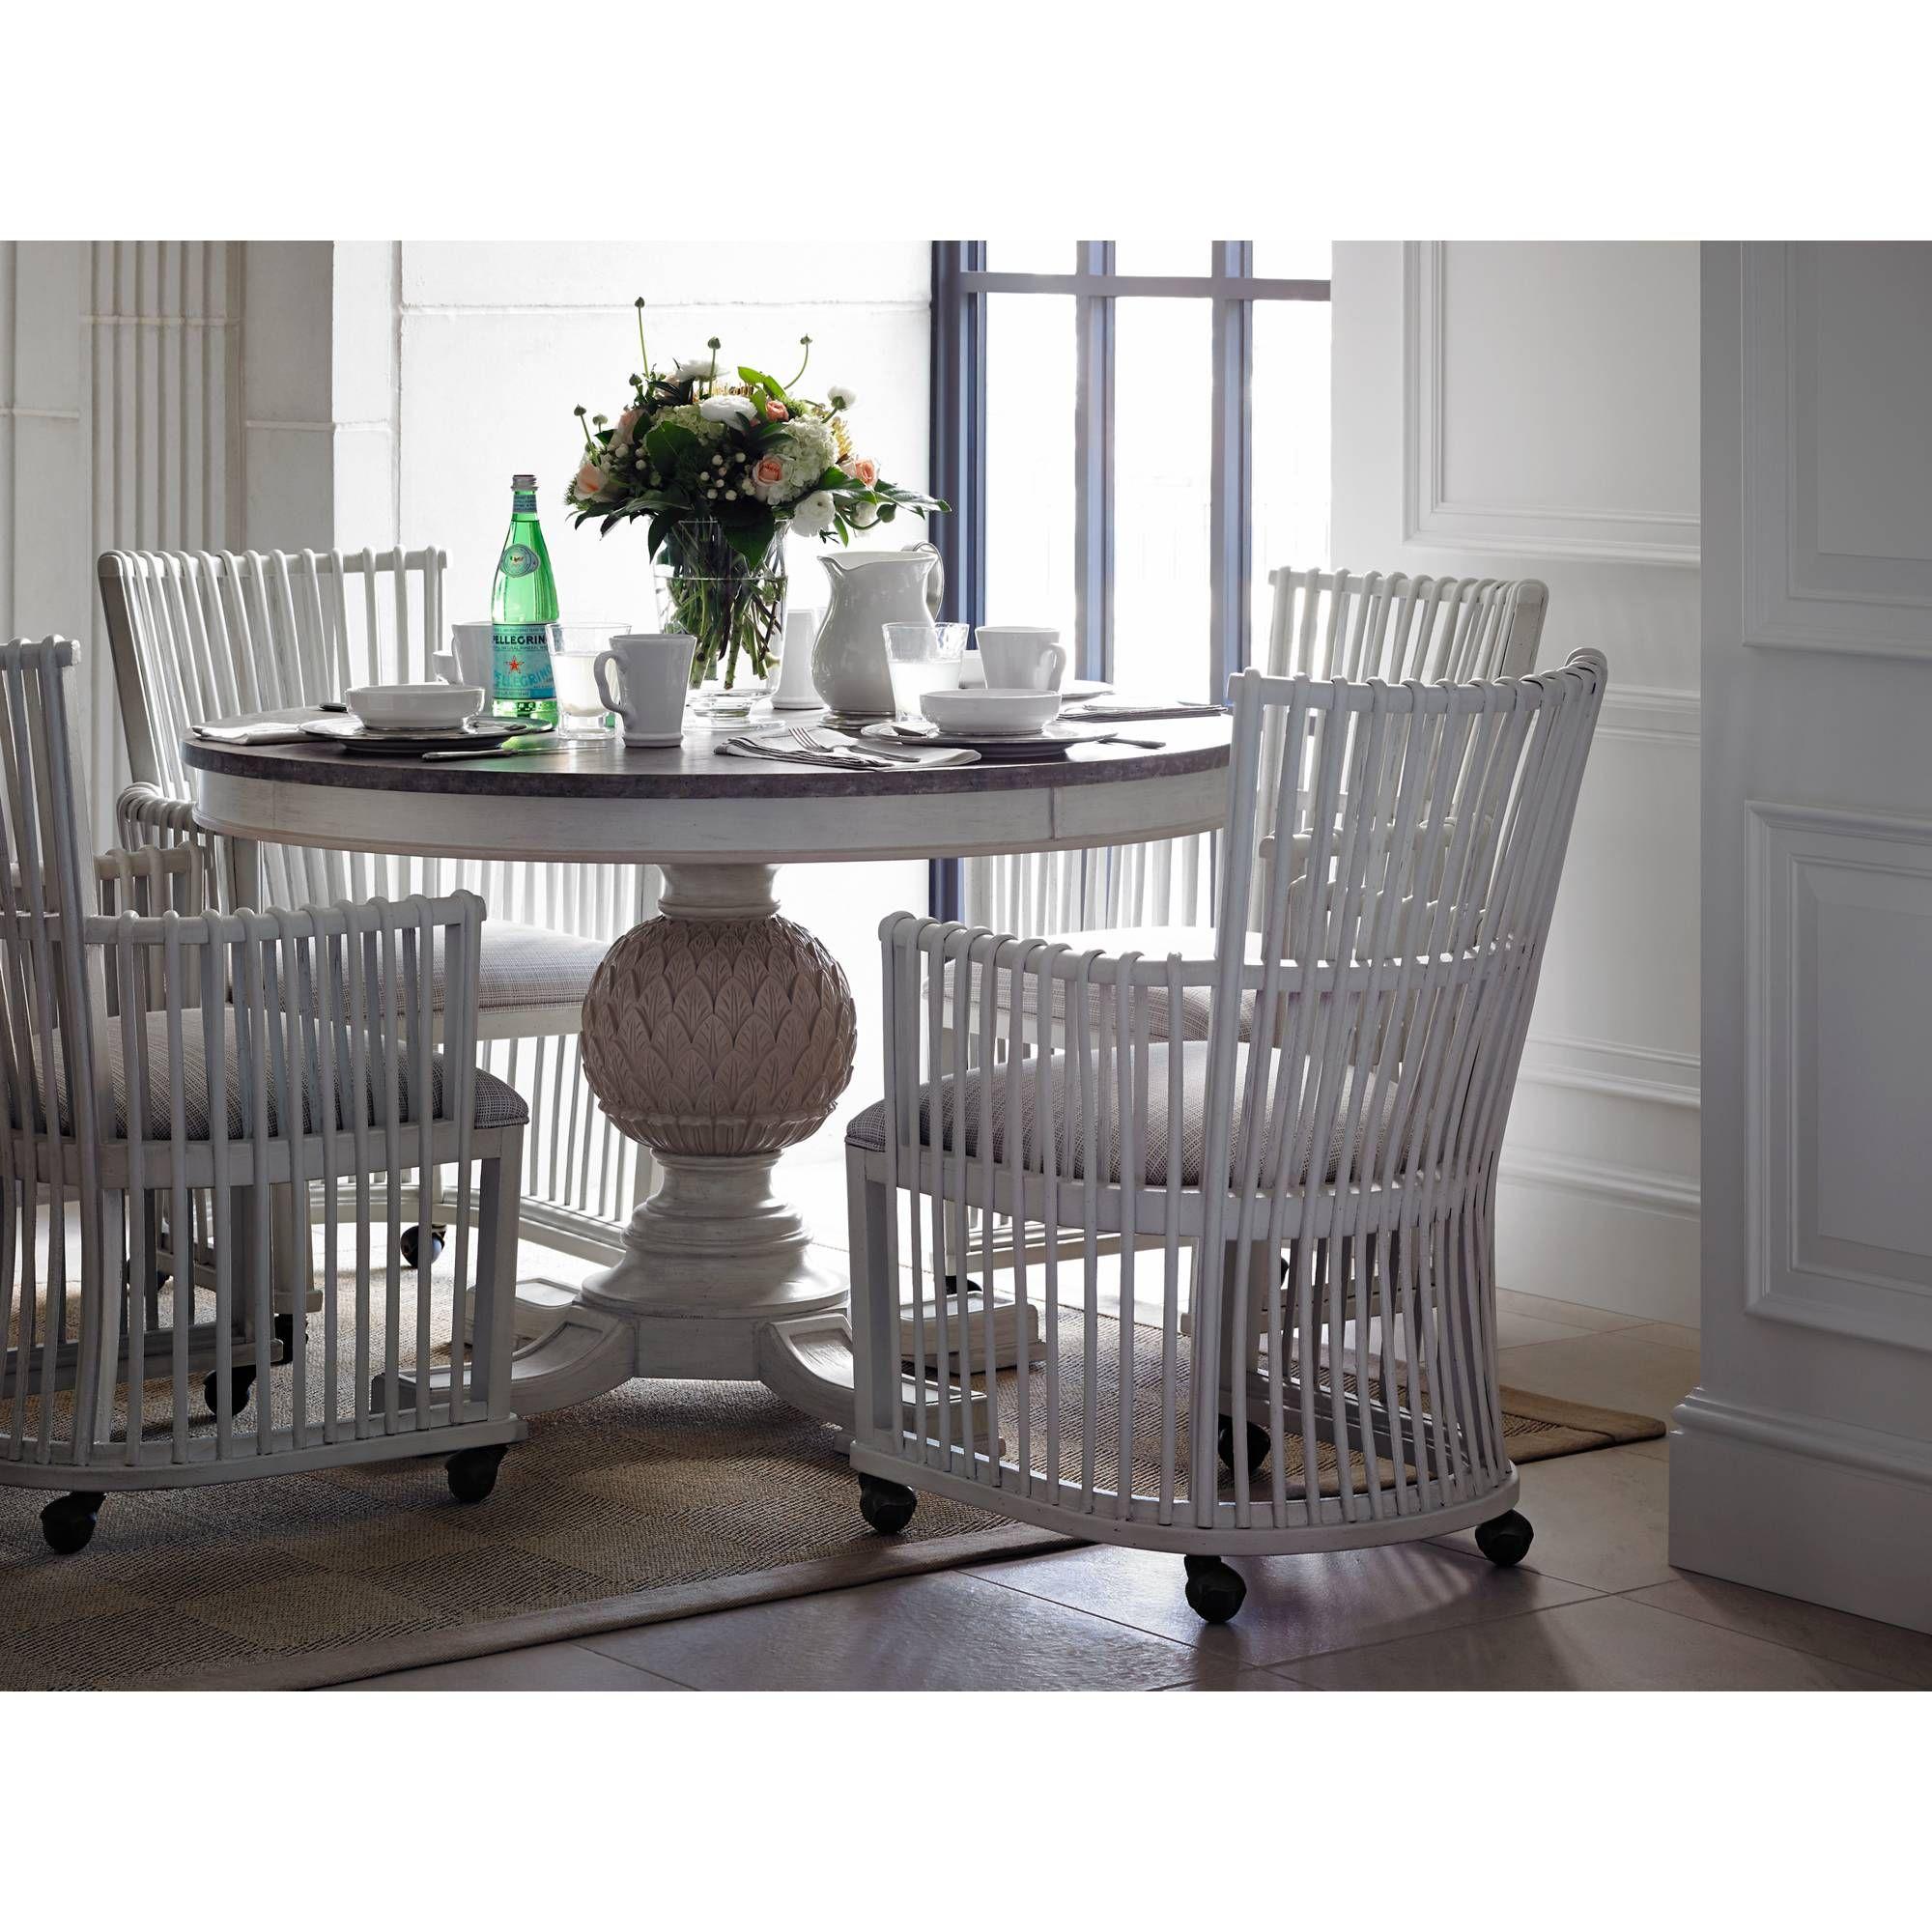 Stanley Preserve 5Pc Artichoke Pedestal Dining Room Set With Prepossessing Stanley Dining Room Set Decorating Design